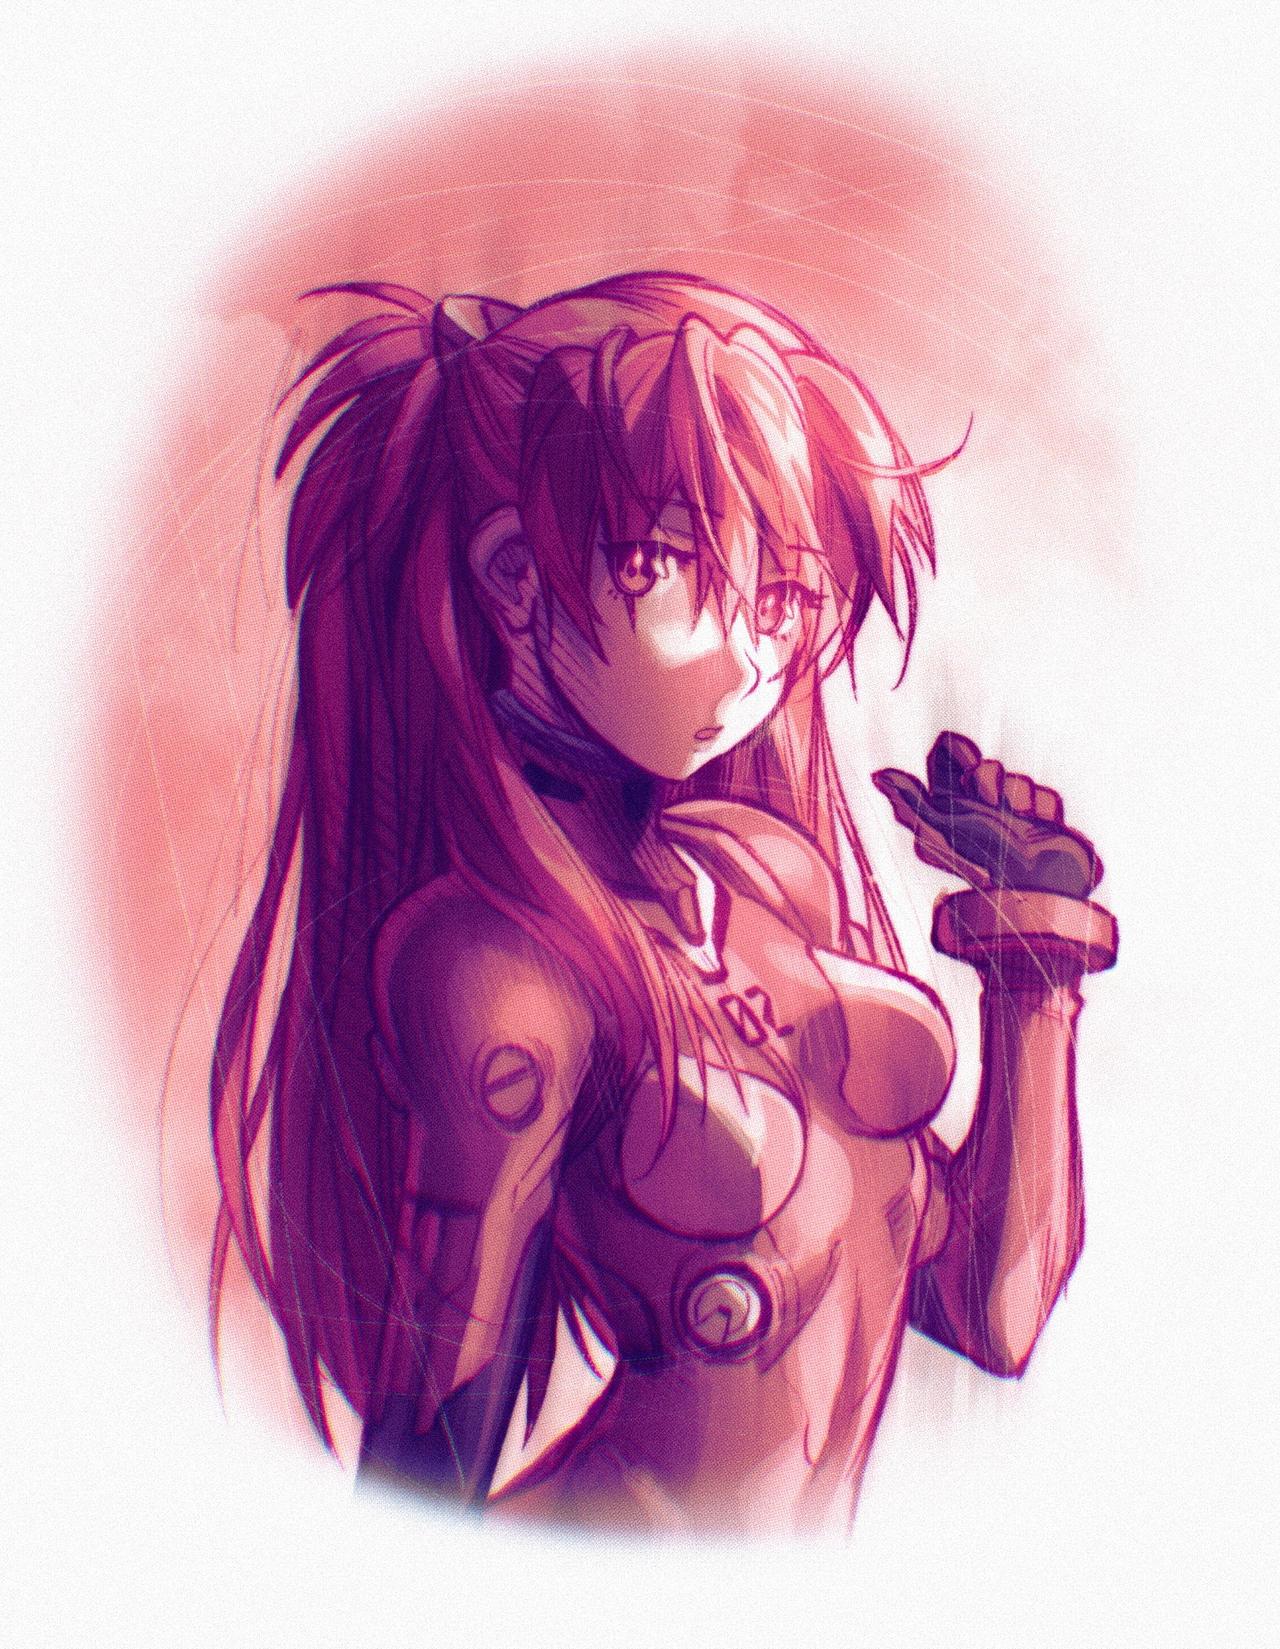 Neon Genesis Evangelion- Asuka